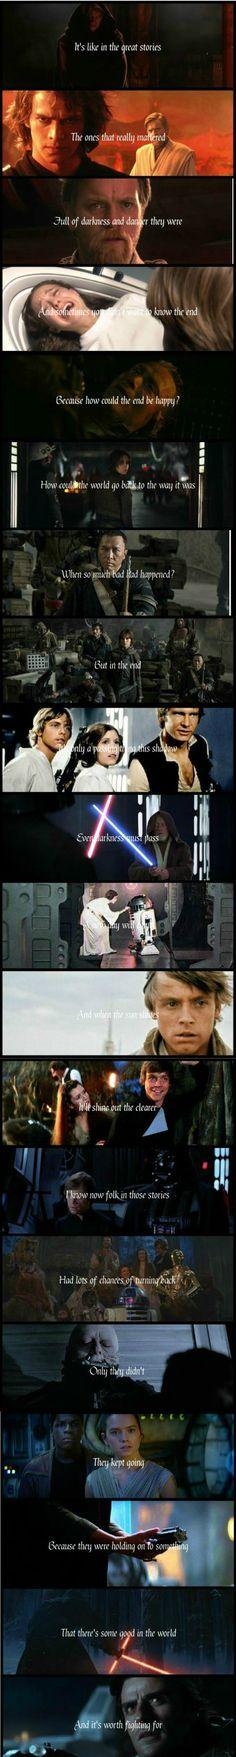 Star Wars Edit by: Princess Yoda. Please give credit if shared.